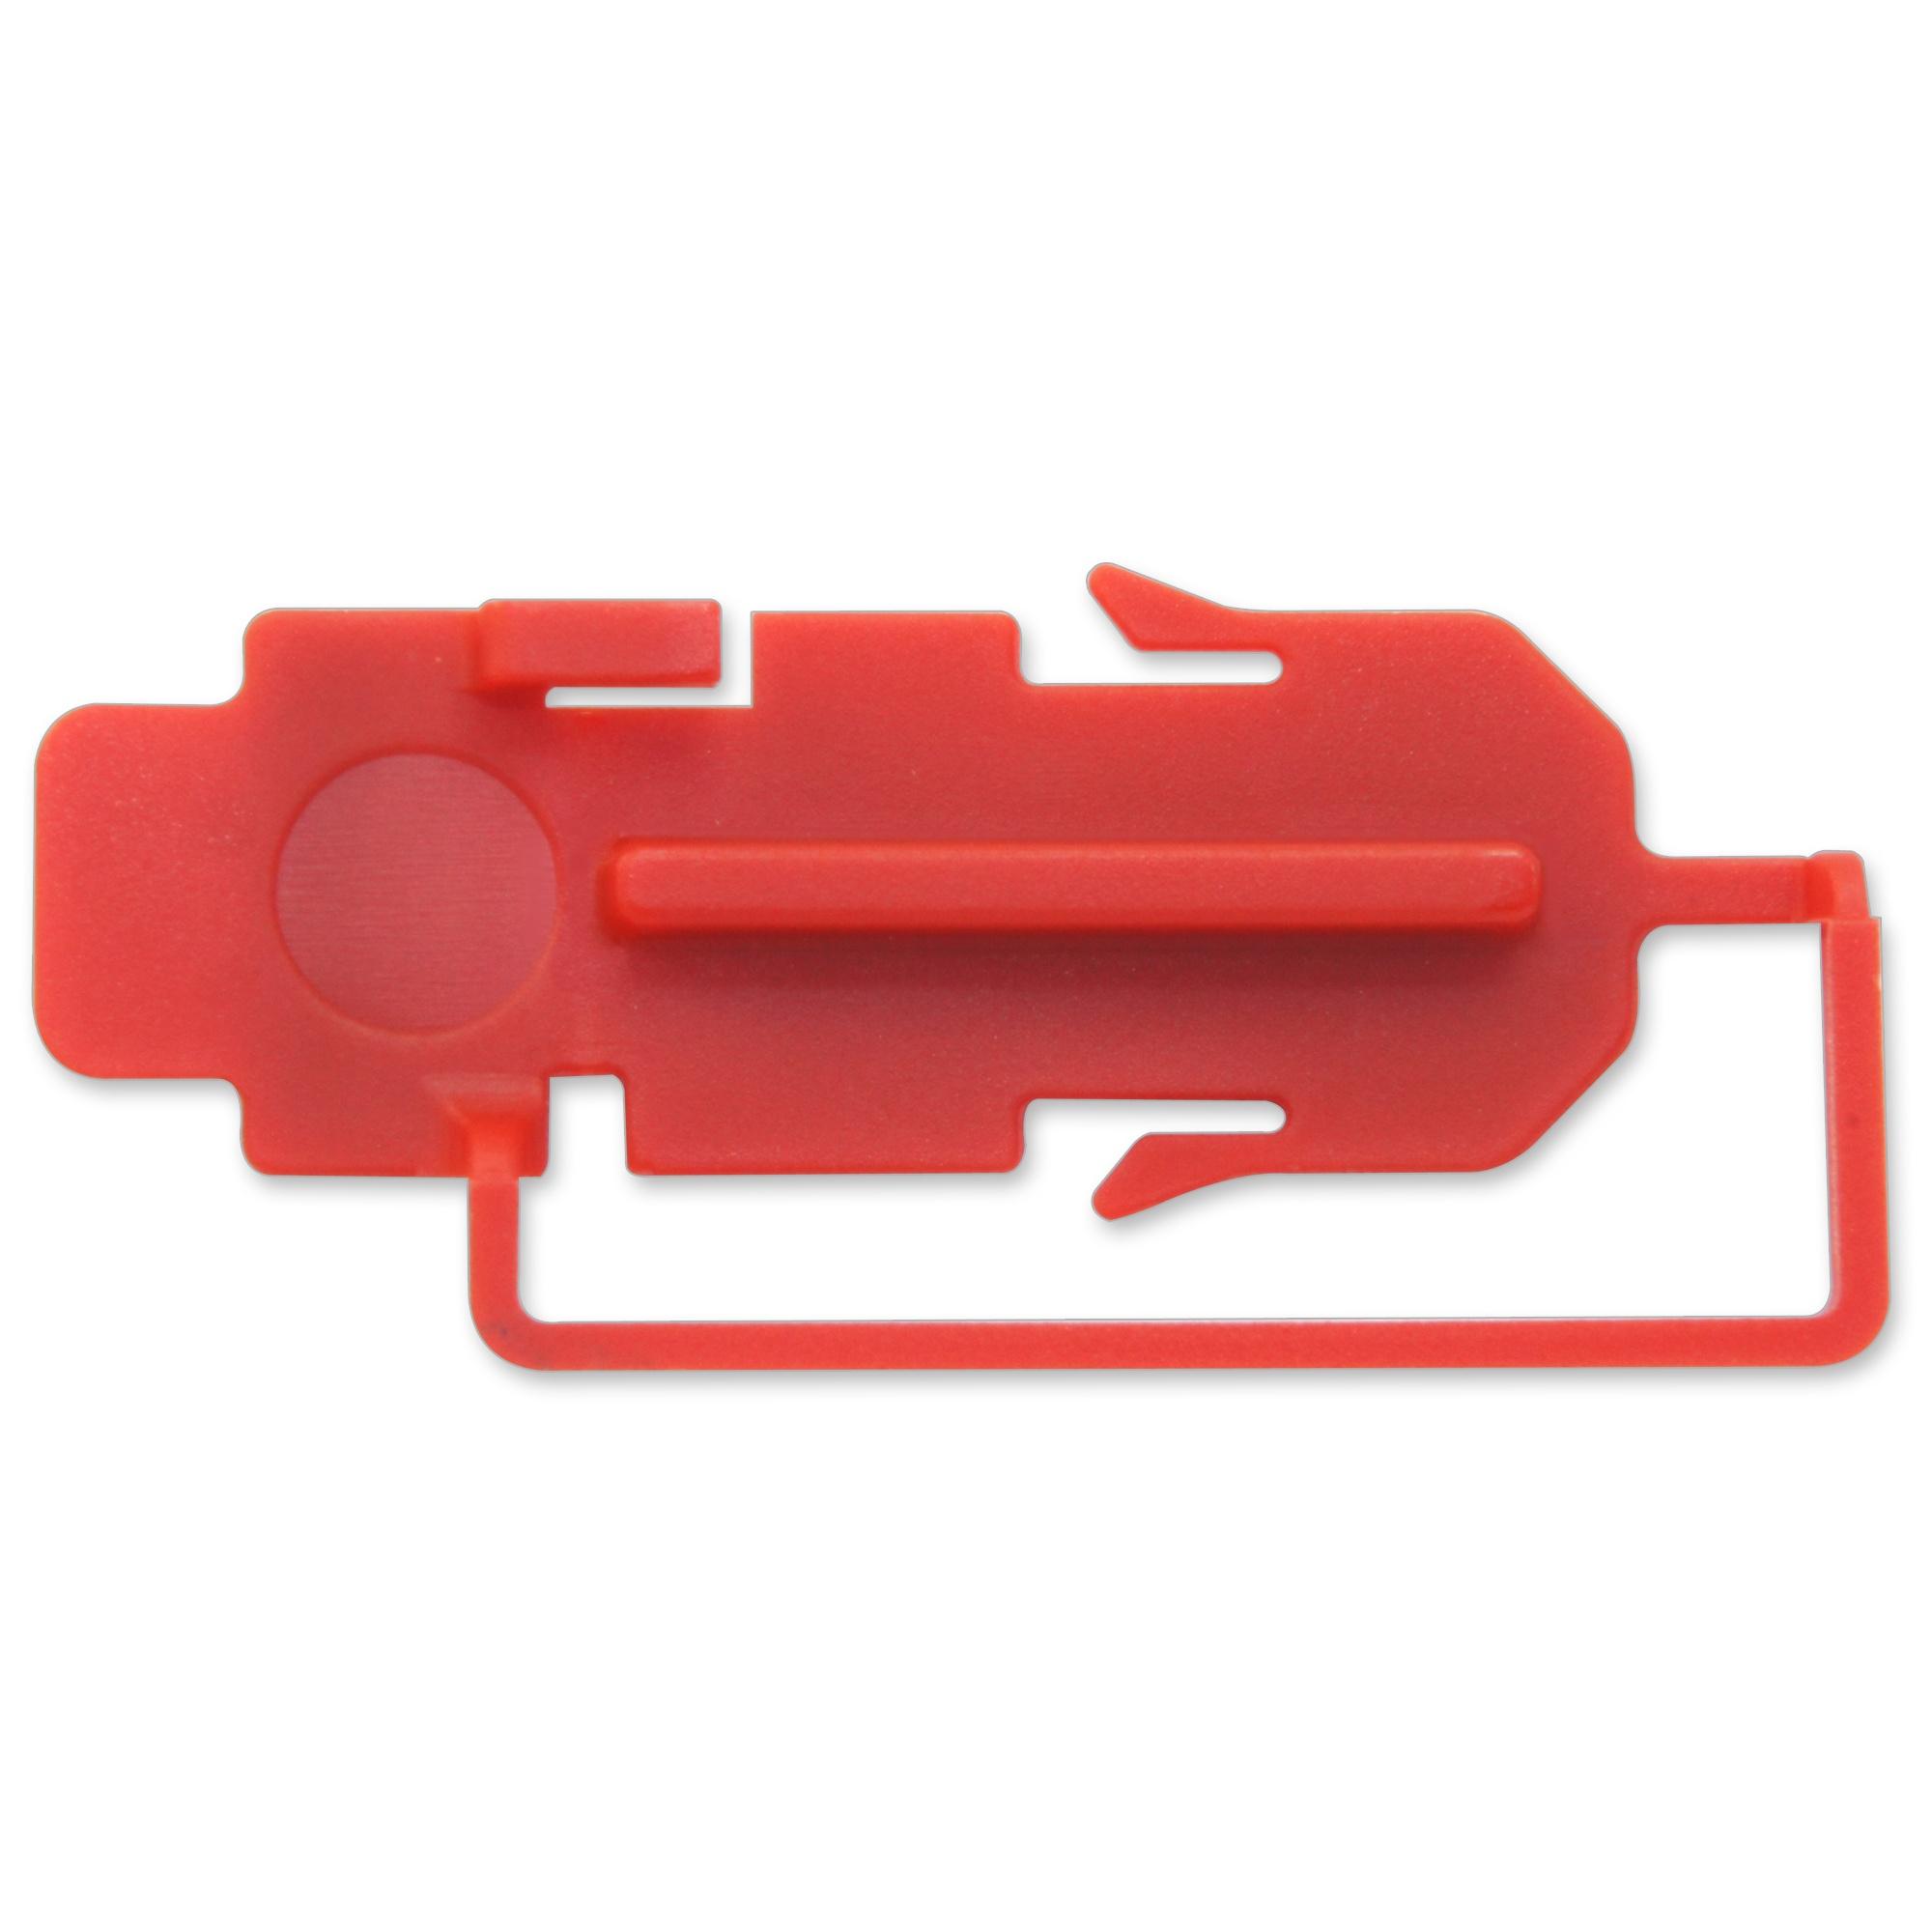 KLS Martin Plastic Seal Image